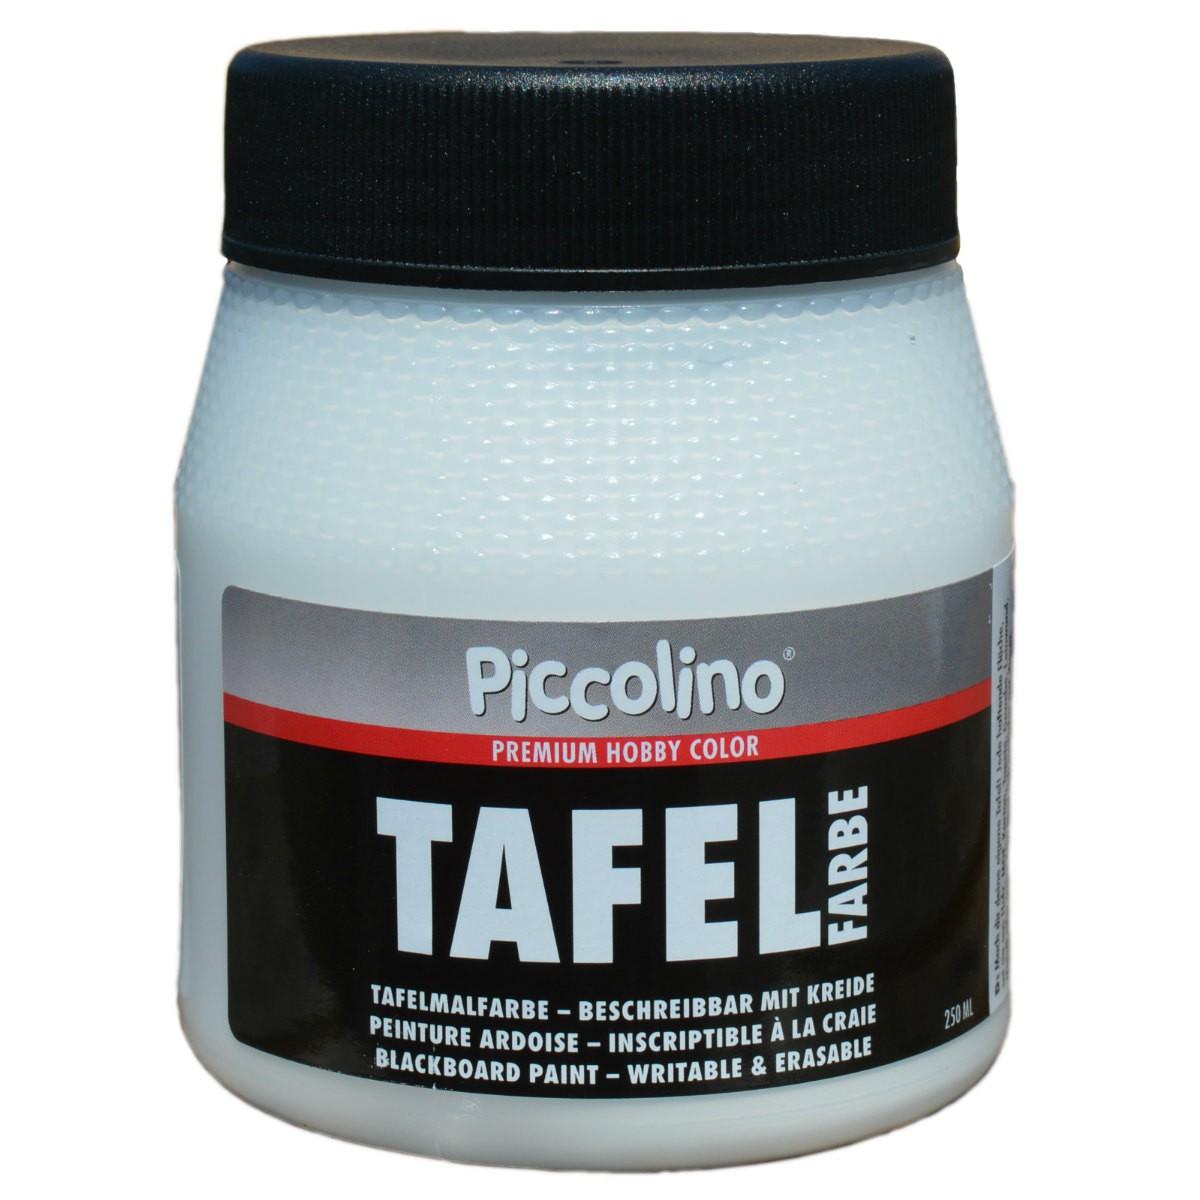 Piccolino peinture ardoise blanc 250ml peinture tableau murale criture la craie for Peinture nacree murale